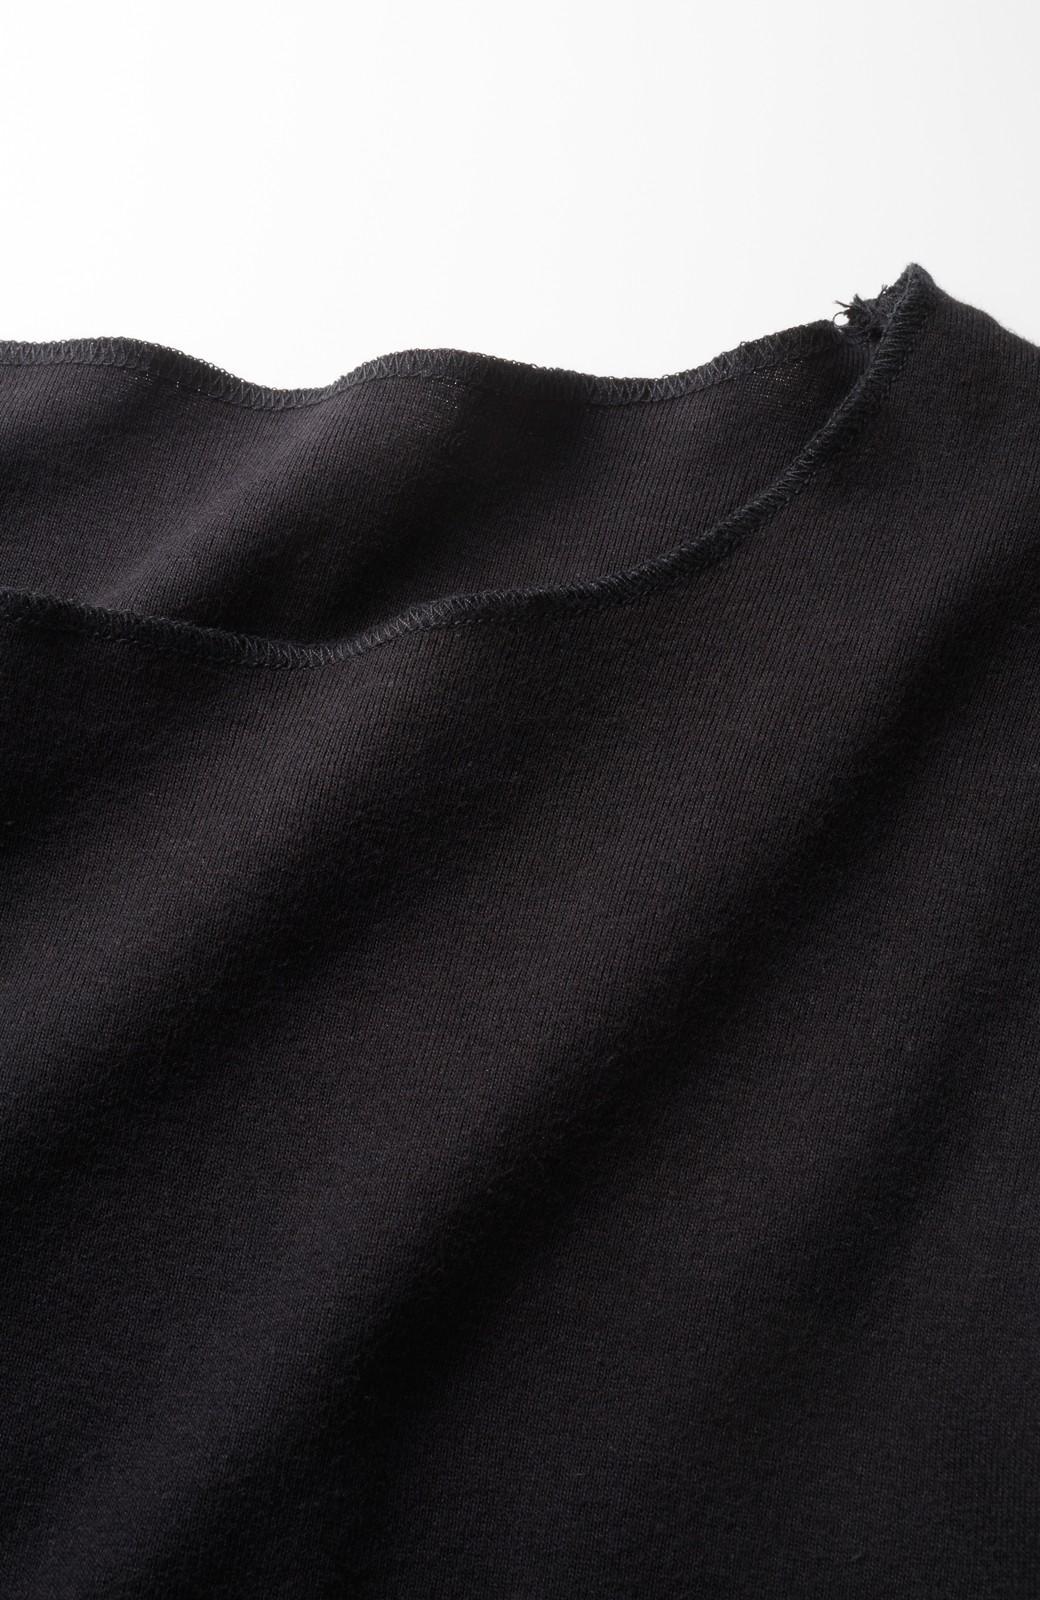 nusy PBP アルガンオイル加工のオーガニックコットン袖フリルトップス <ブラック>の商品写真3